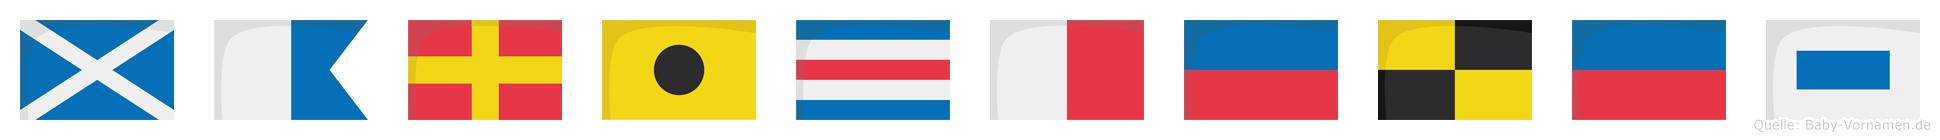 Maricheles im Flaggenalphabet